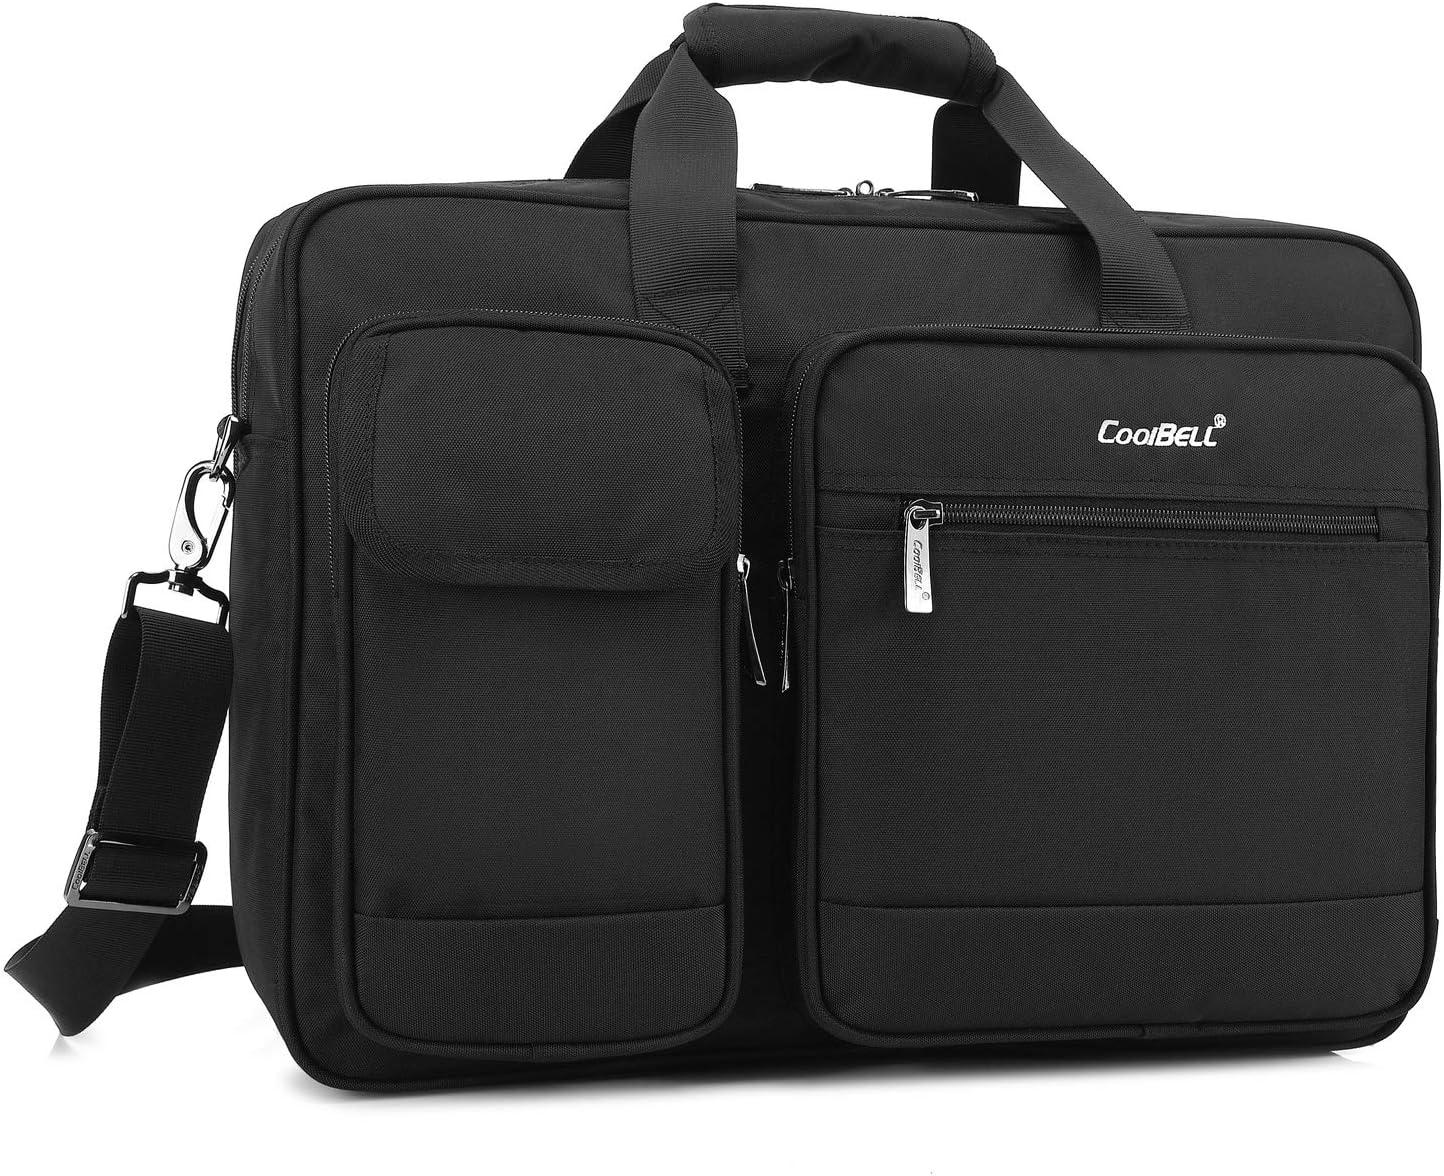 CoolBELL 15.6 Inch Laptop Messenger Bag Briefcase Protective Shoulder Bag Multi-Functional Business Hand Bag for Laptop/Ultrabook/Tablet/MacBook/Dell/HP/Men/Women (15.6 Inches, Black)